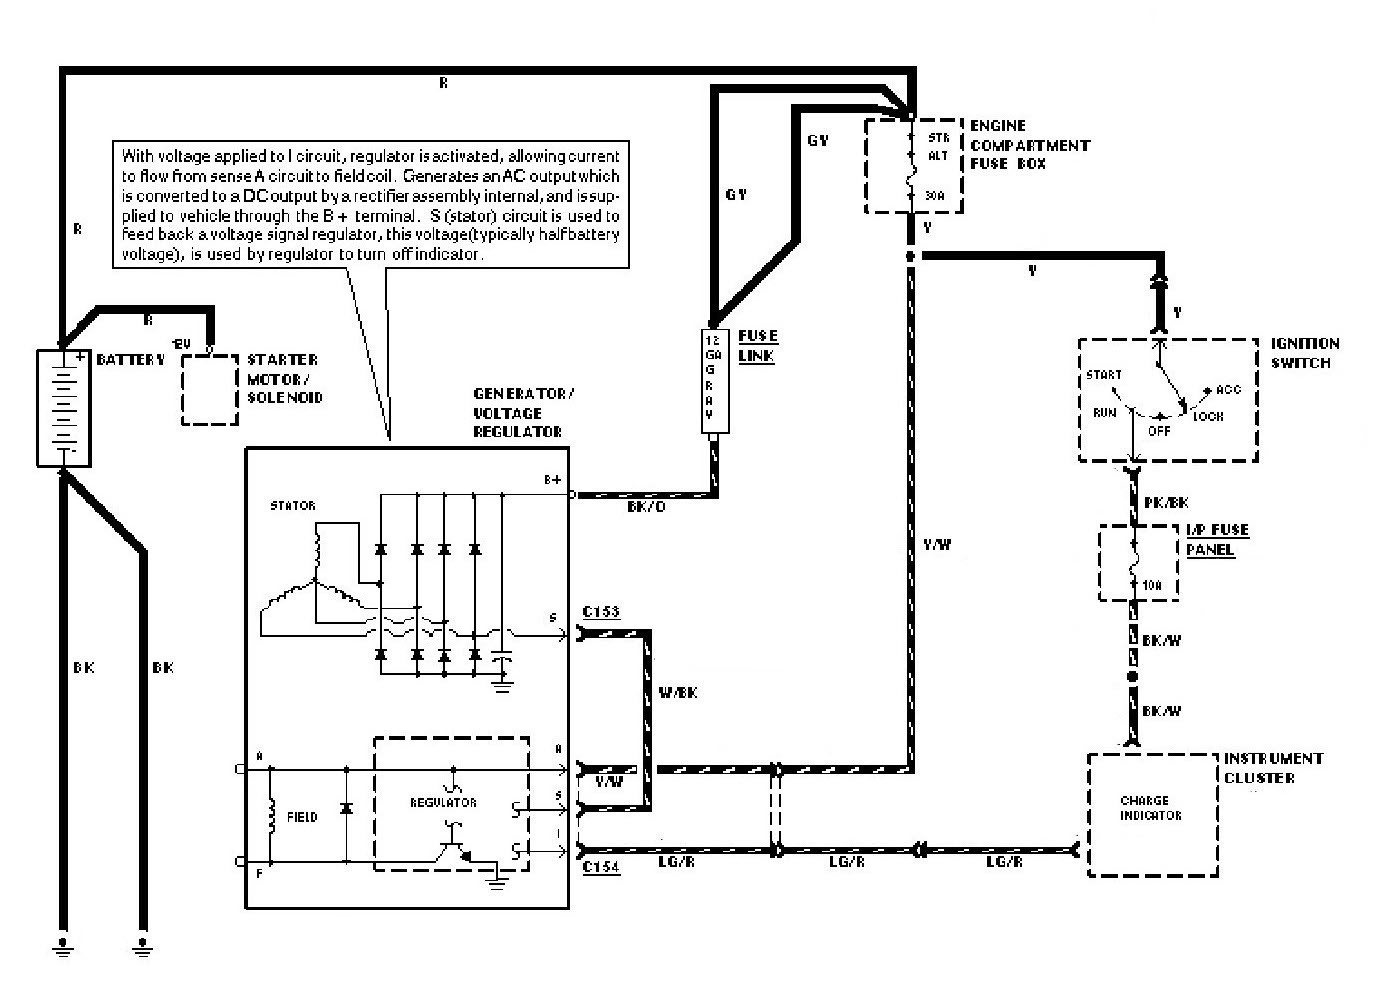 Internal Alternator Regulator Wiring Diagram | Wiring Library - Ford Alternator Wiring Diagram Internal Regulator